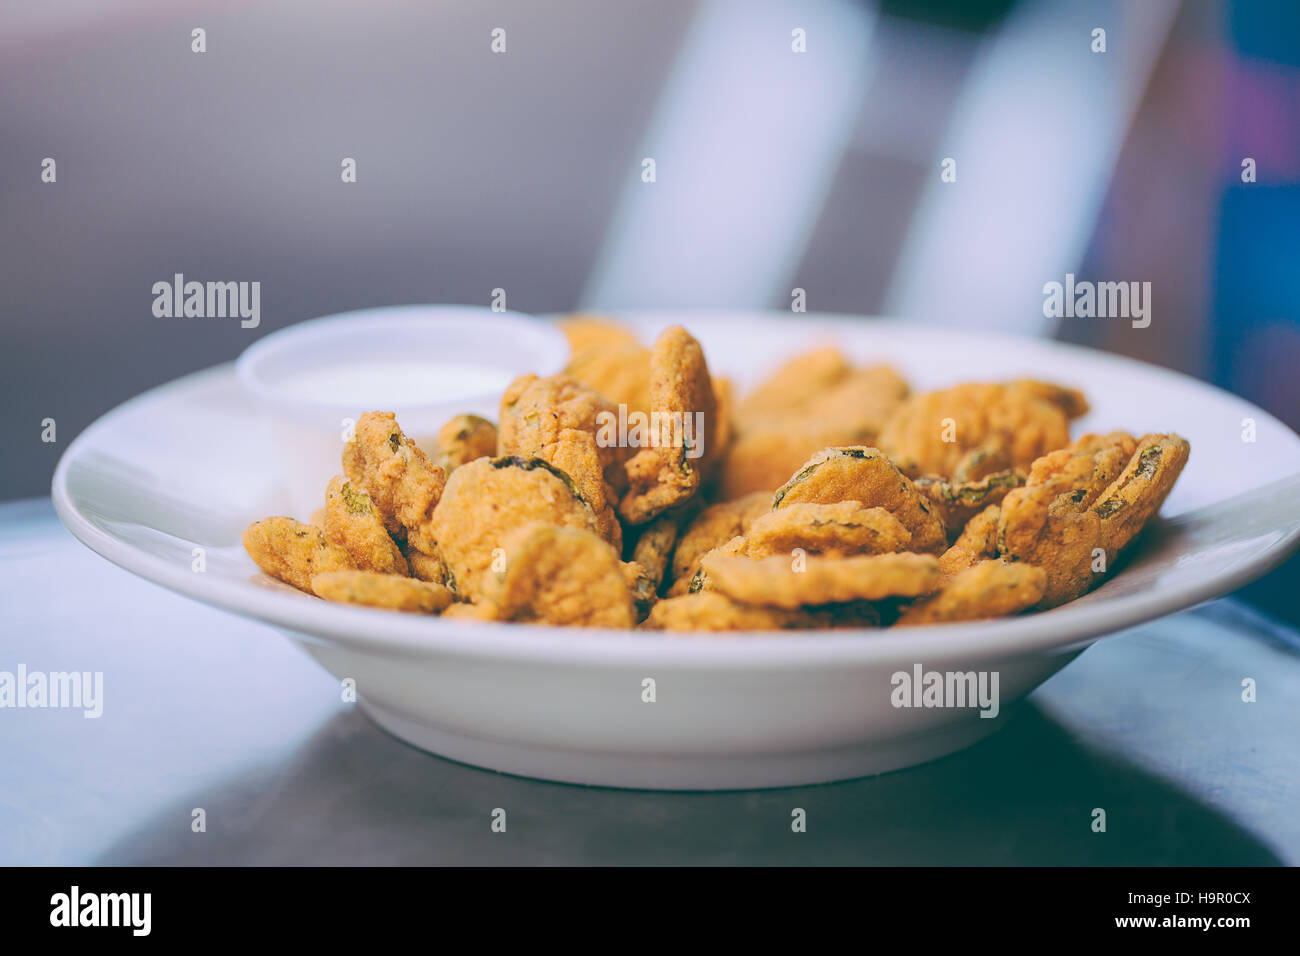 Deep-fried dill pickles, Cajun food - Stock Image